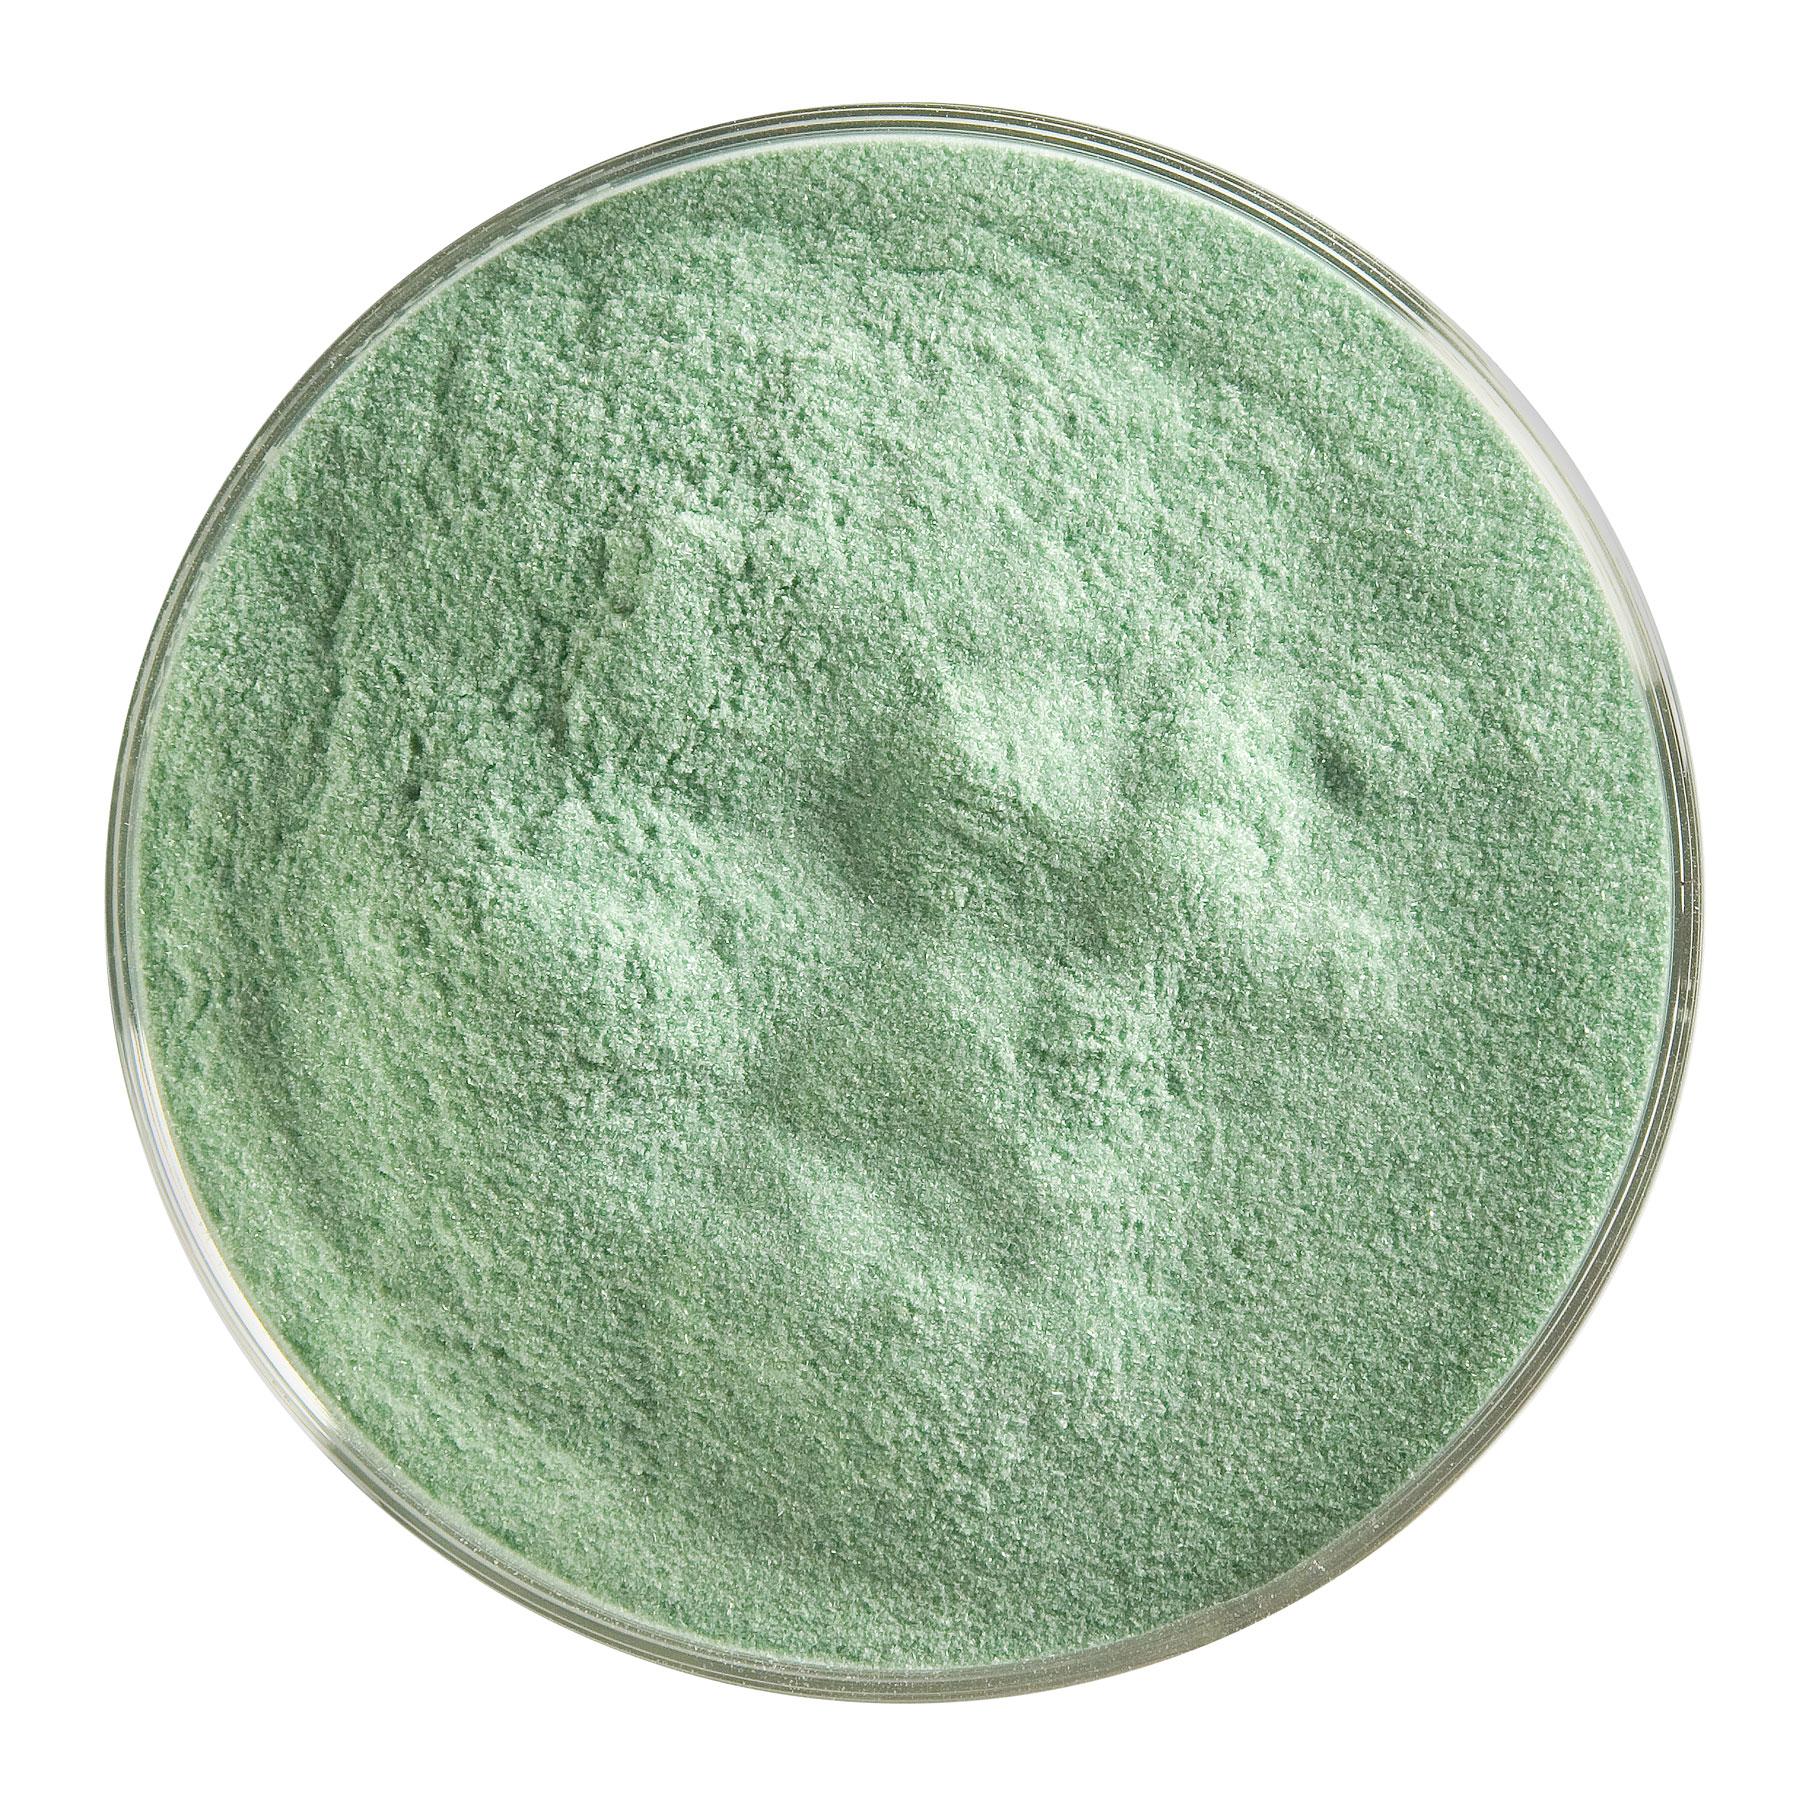 90 Coe 1 Lb Aventurine Blue Powder Frit